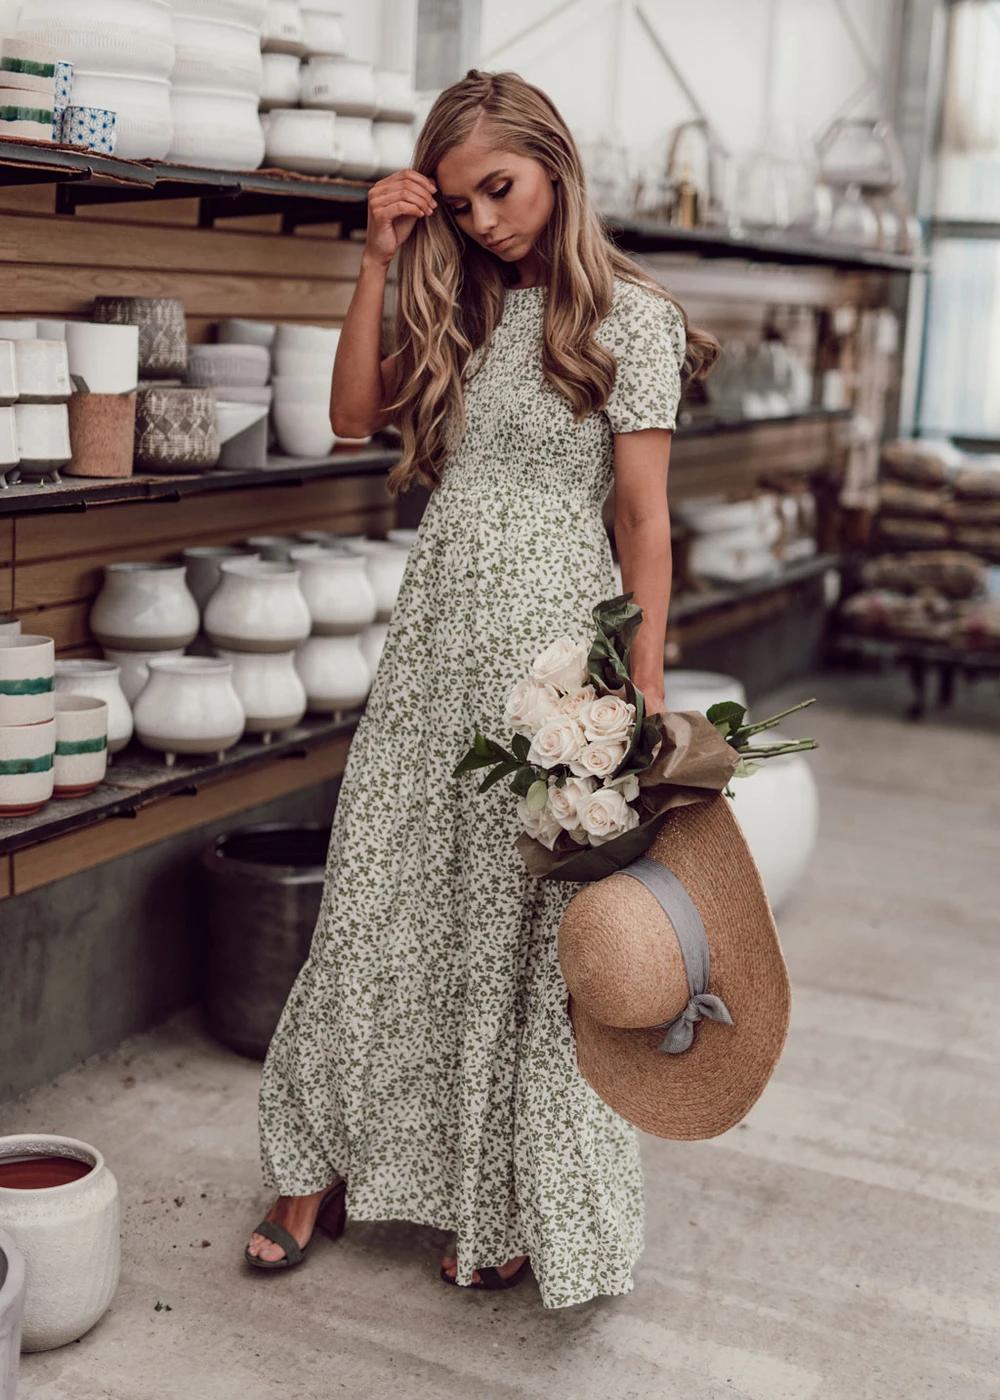 Sweet Caroline Maxi Dress Jessakae Green Dress Bridesmaid Dress Modest Dress Floral Shoot Tan Skin Modest Dresses Casual Maxi Dress Maxi Dresses Casual [ 1400 x 1000 Pixel ]